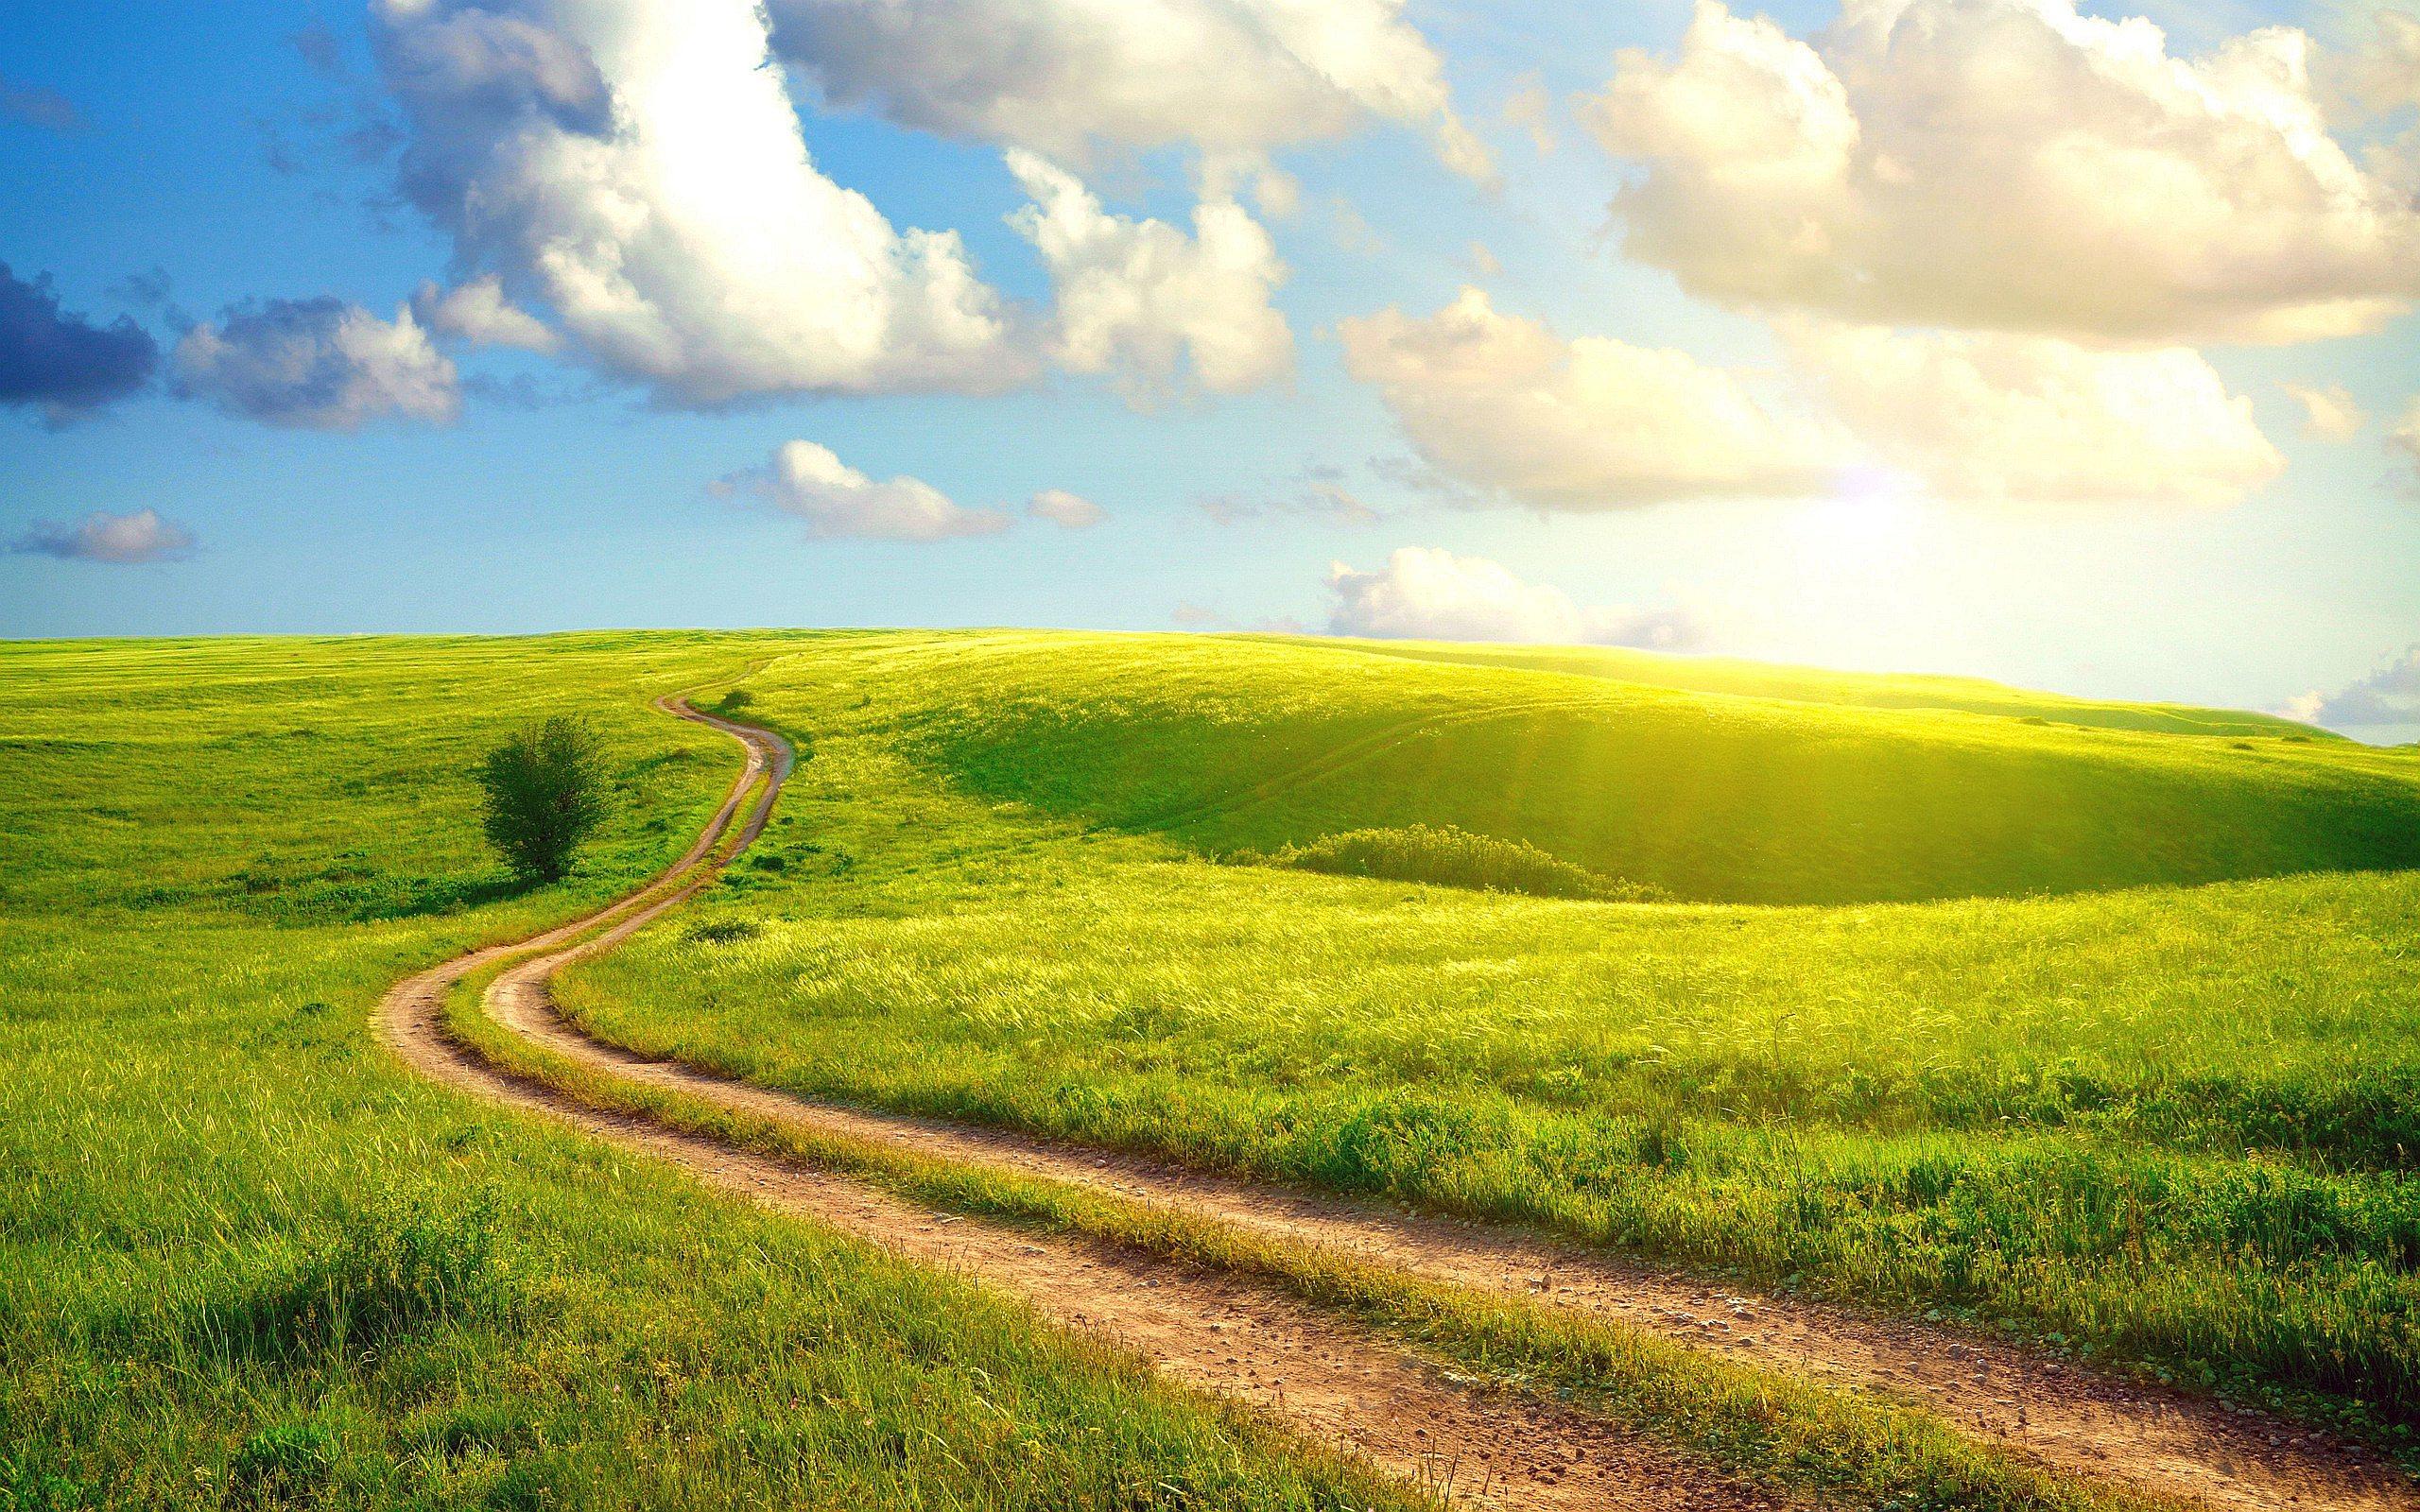 Summer day Meadow wallpaper 2560x1600 31996 2560x1600